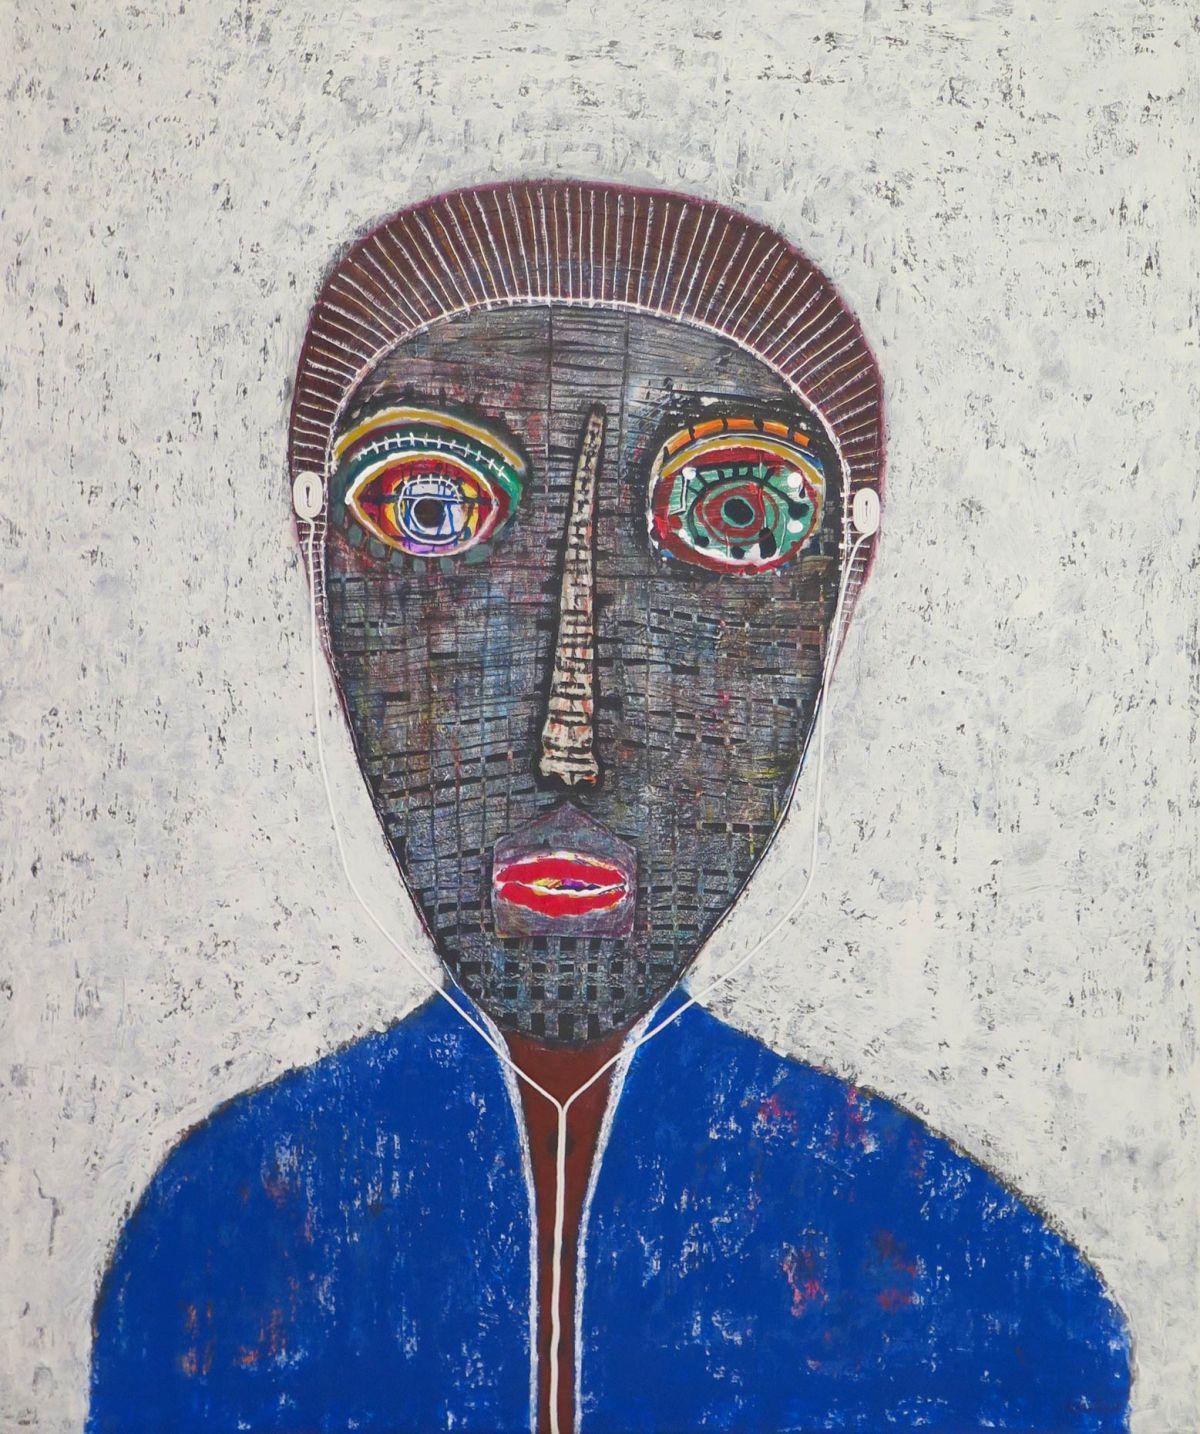 bryant-toth-fine-art-hector-frank-exhibition-9